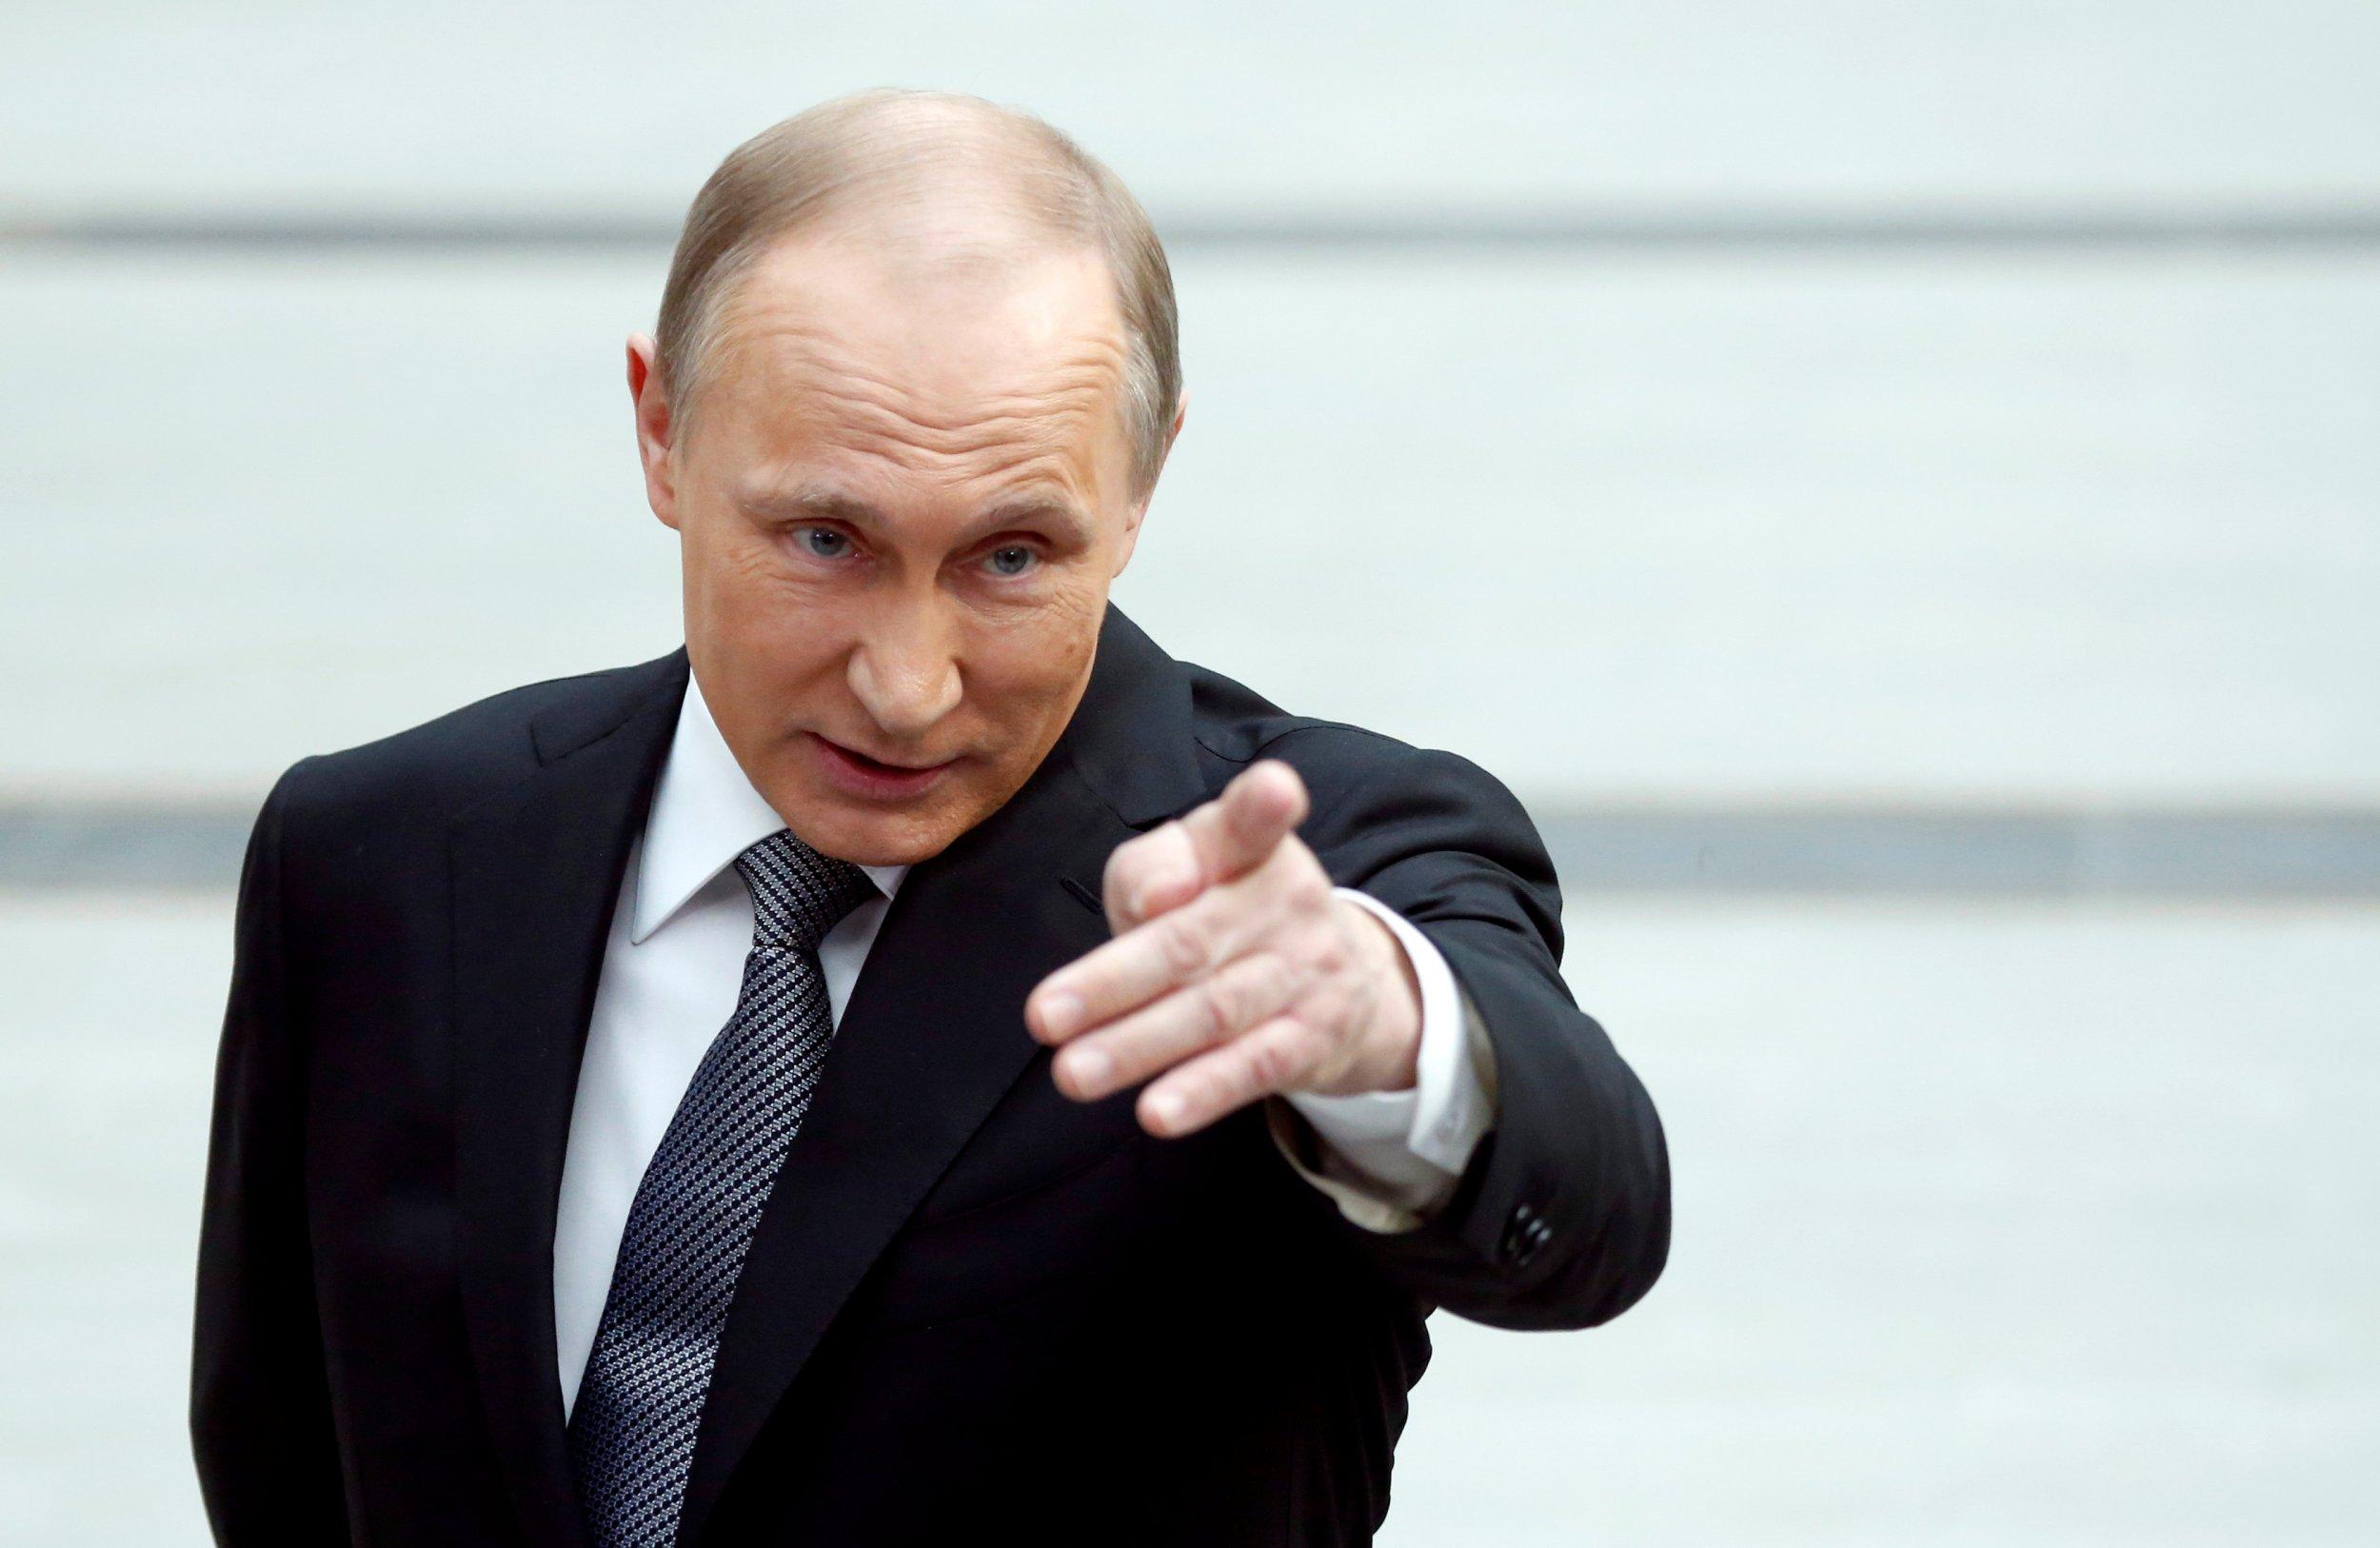 Putin points to camera